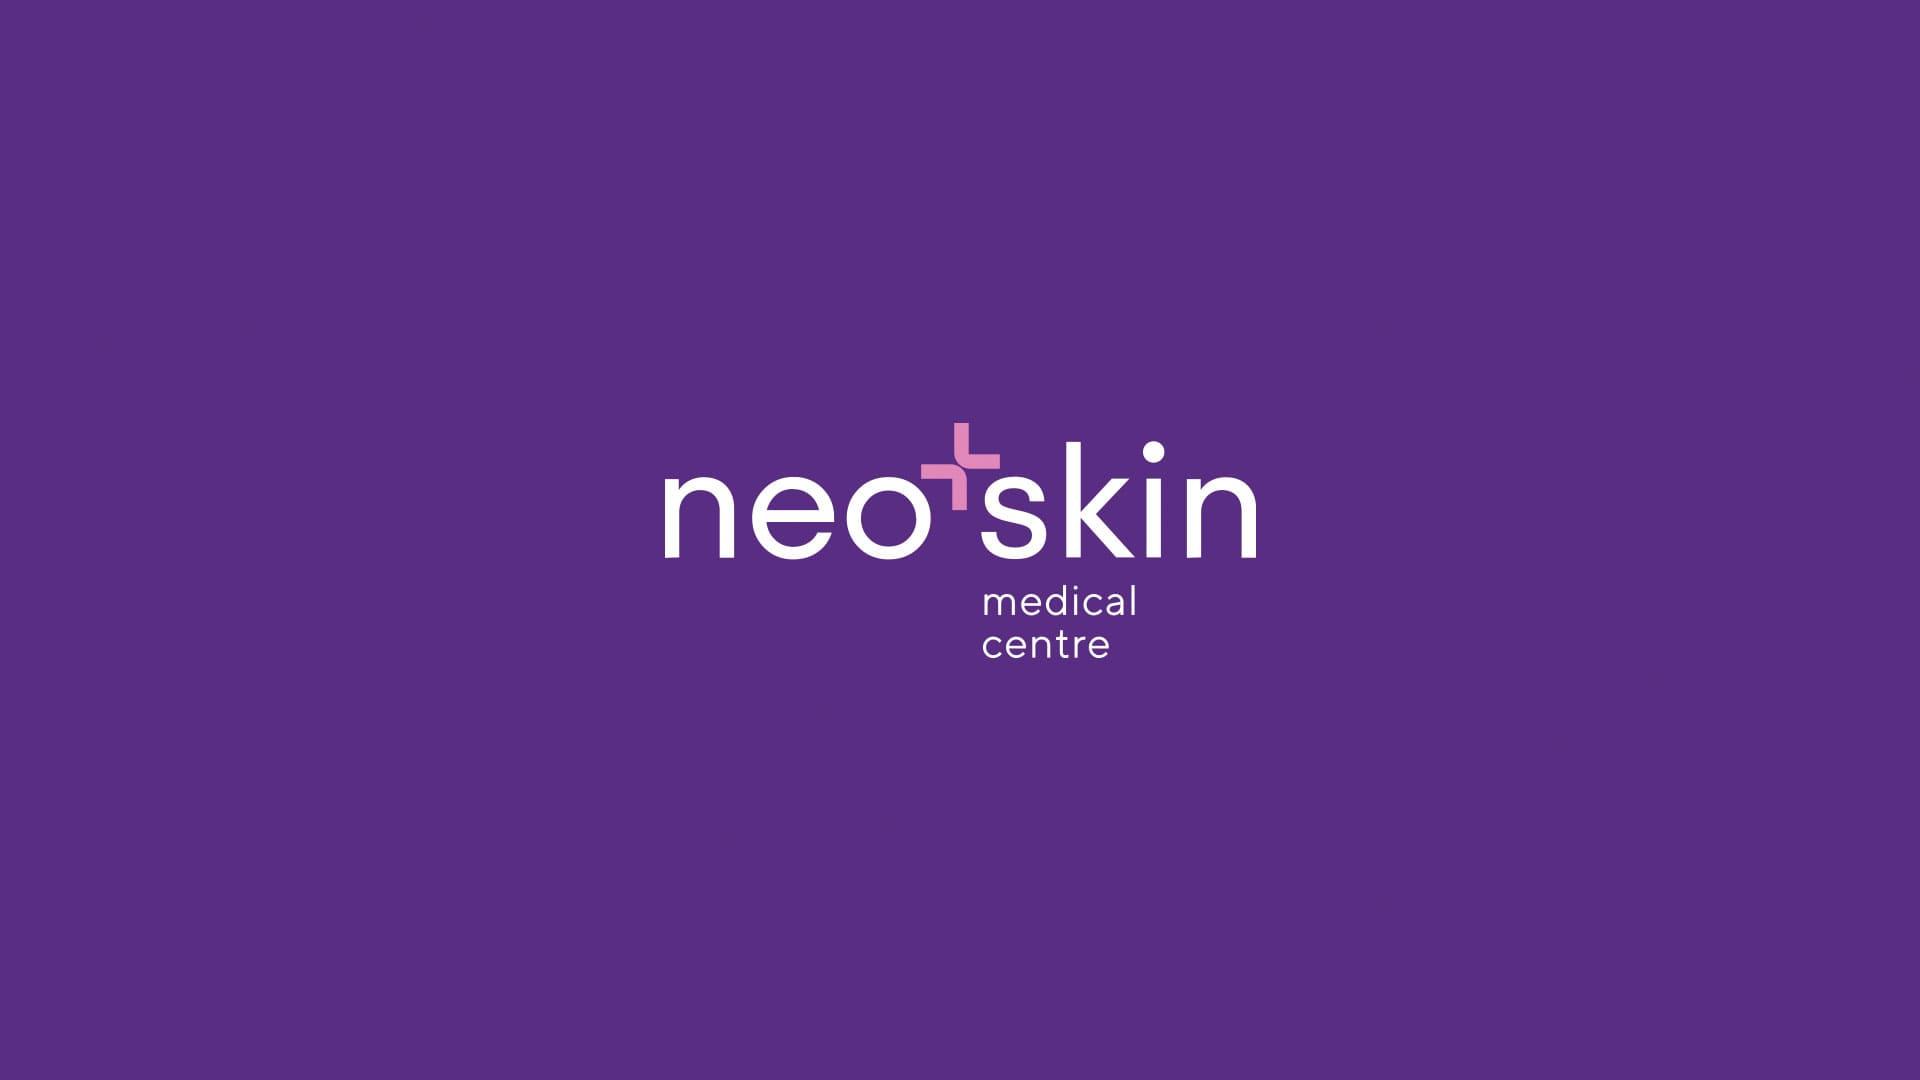 gra brand design neo skin 1